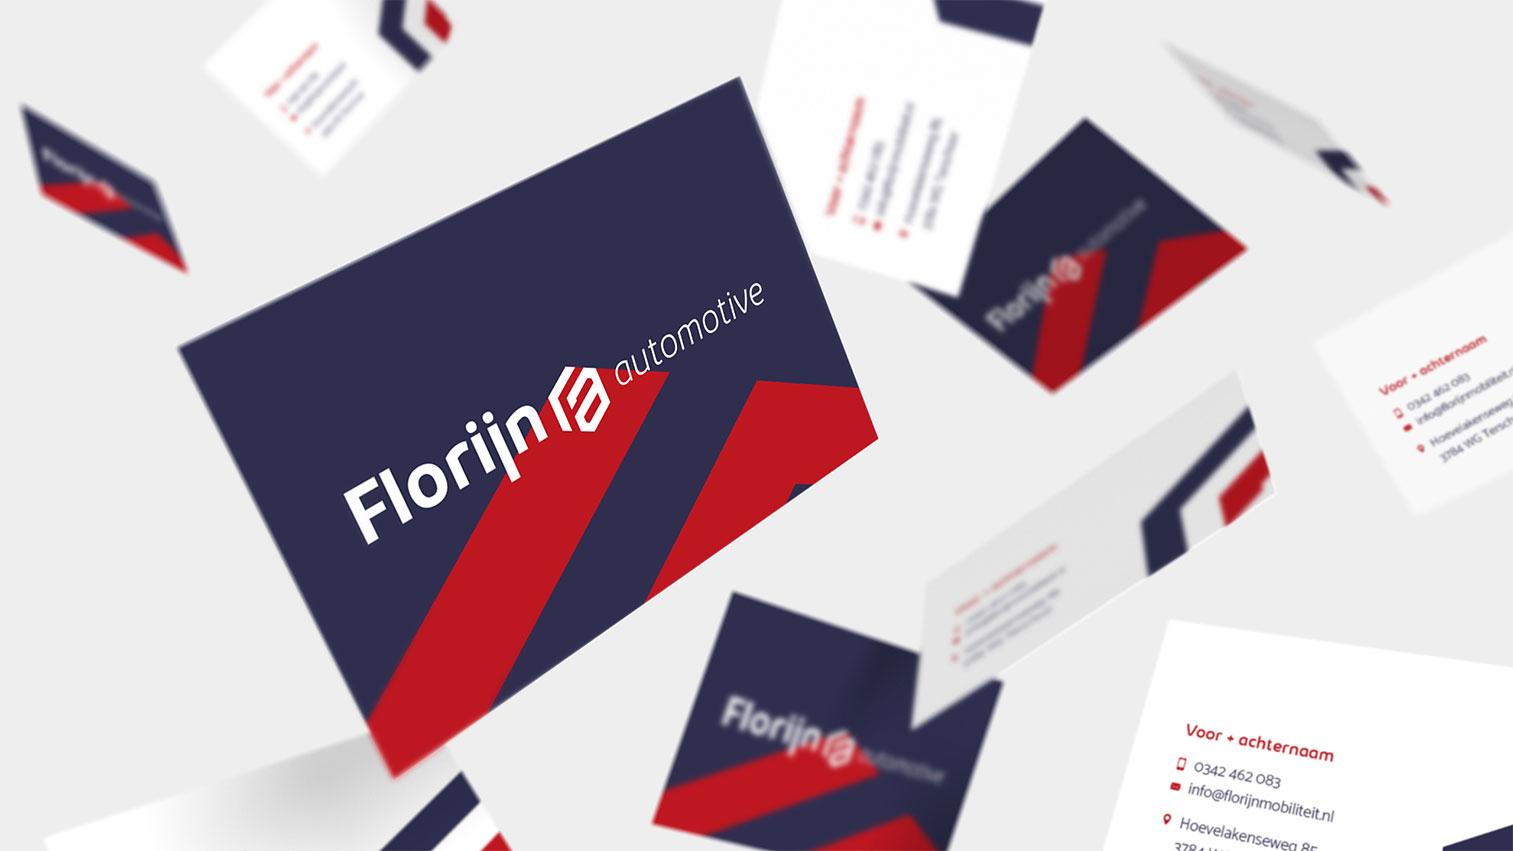 Florijn-automotive-beeld-5